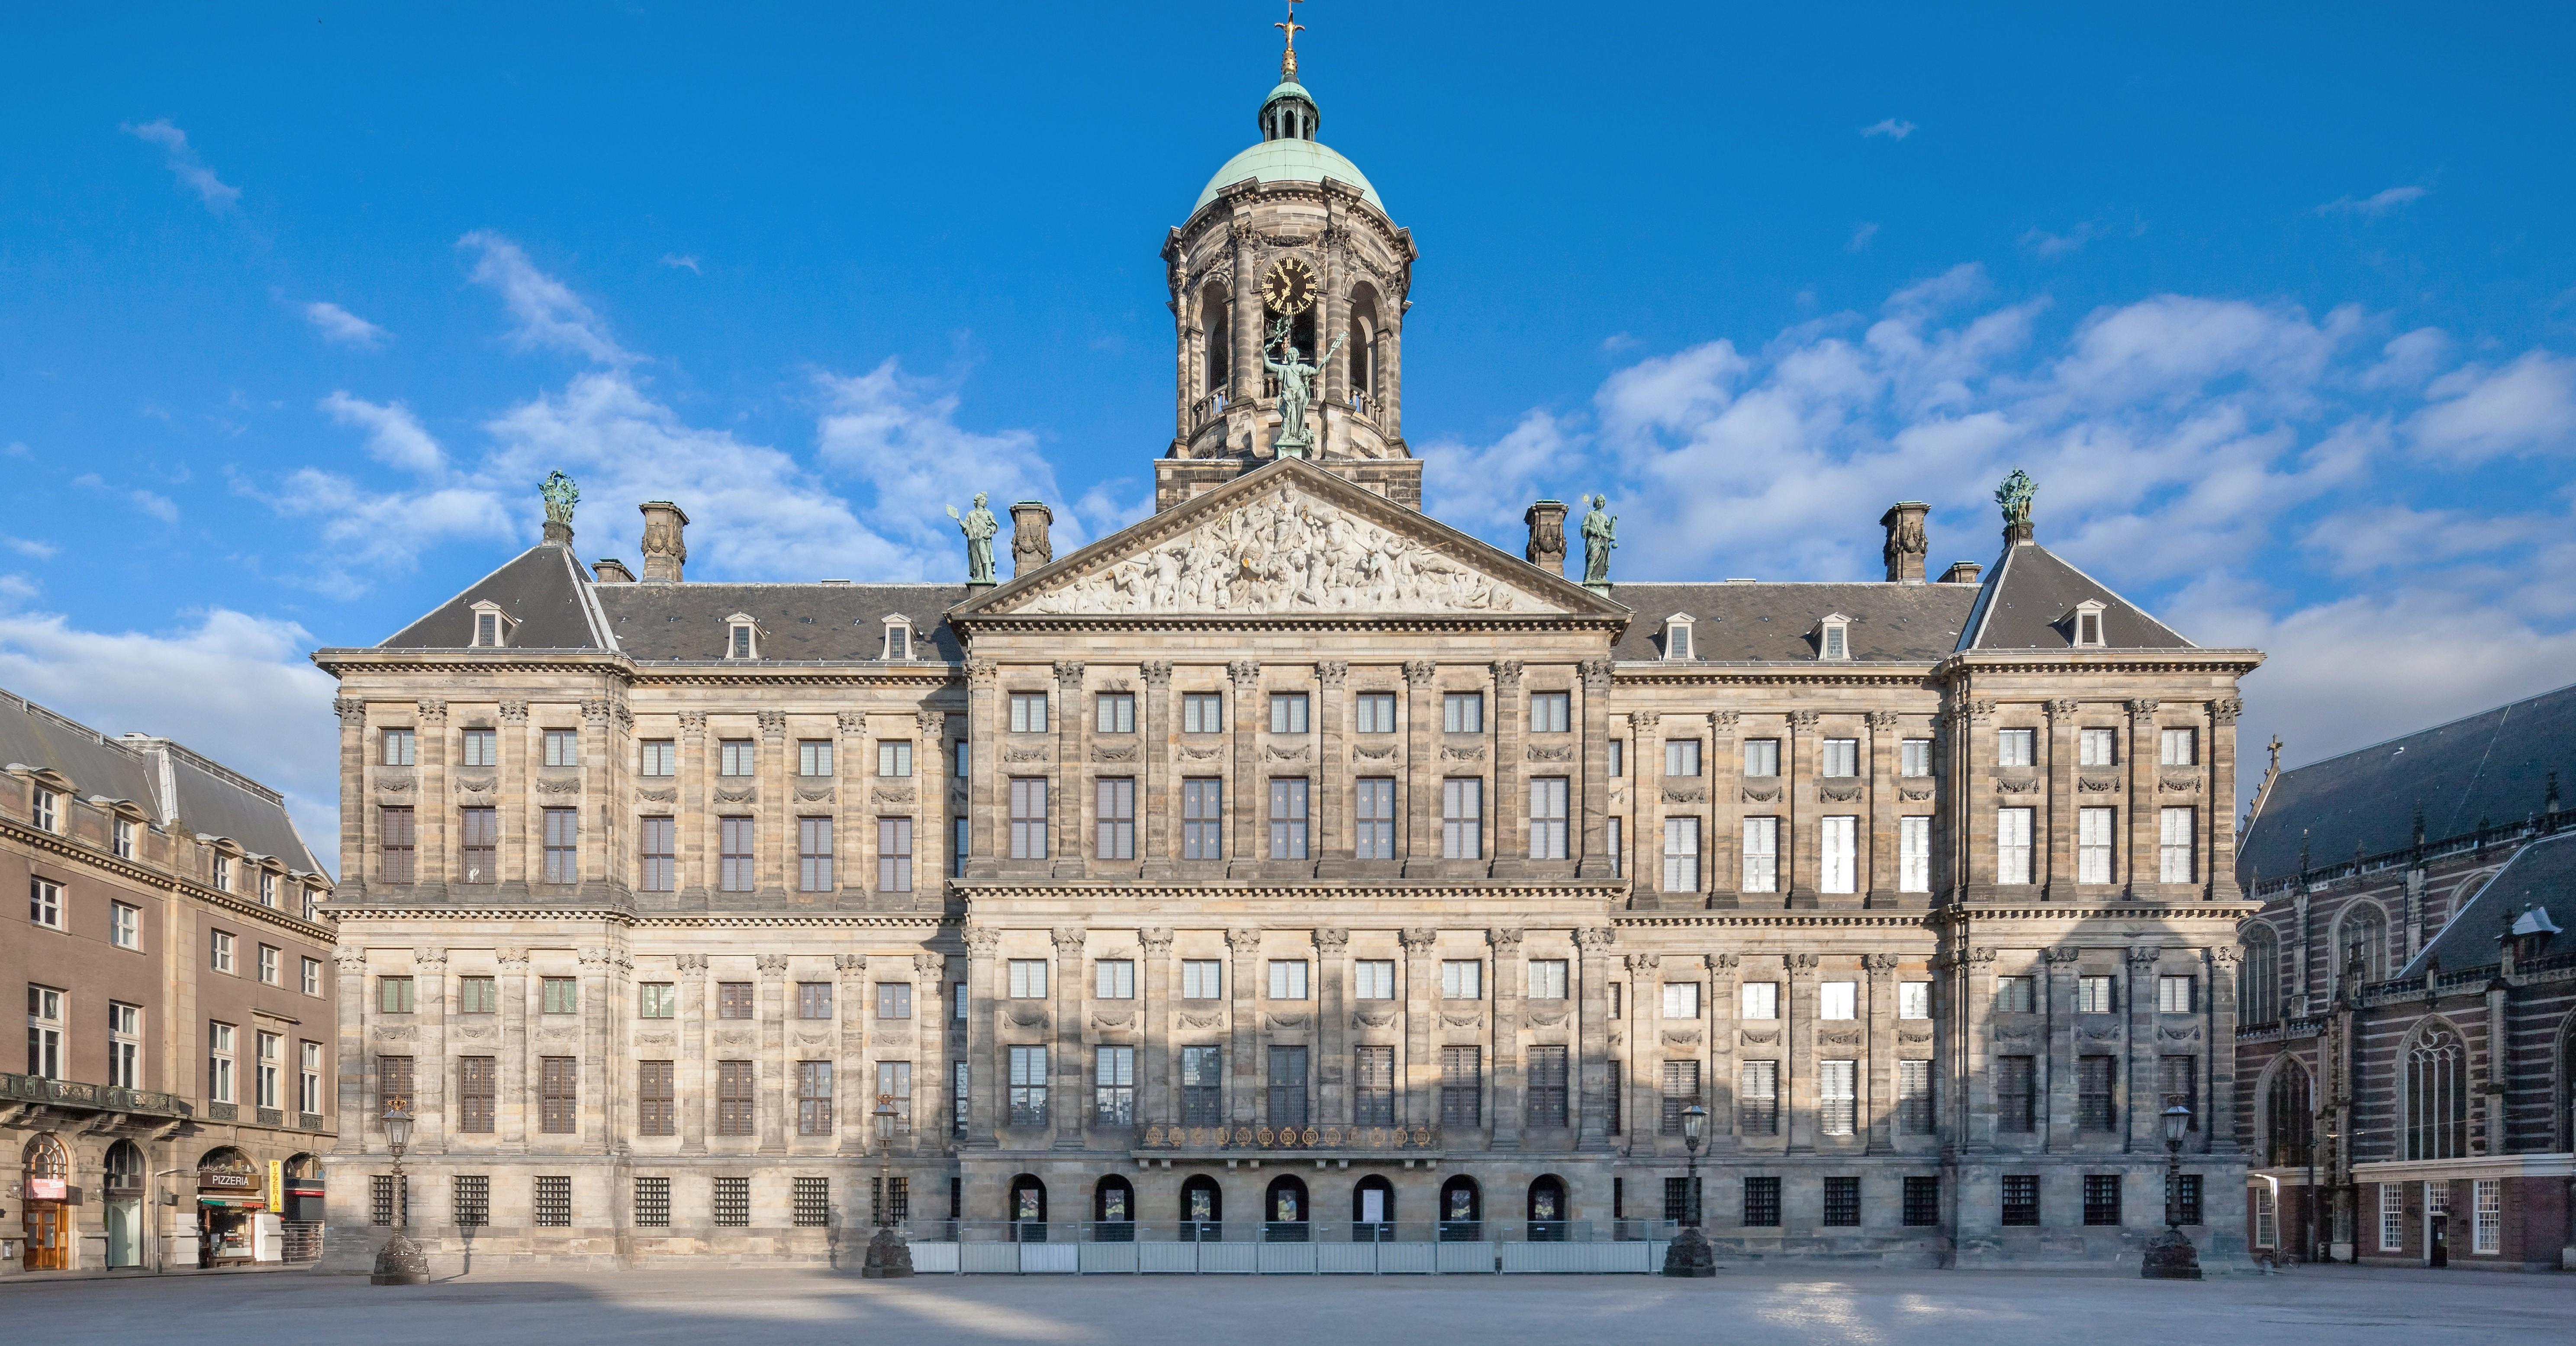 Where To Find Dutch Golden Age Architecture In Amsterdam